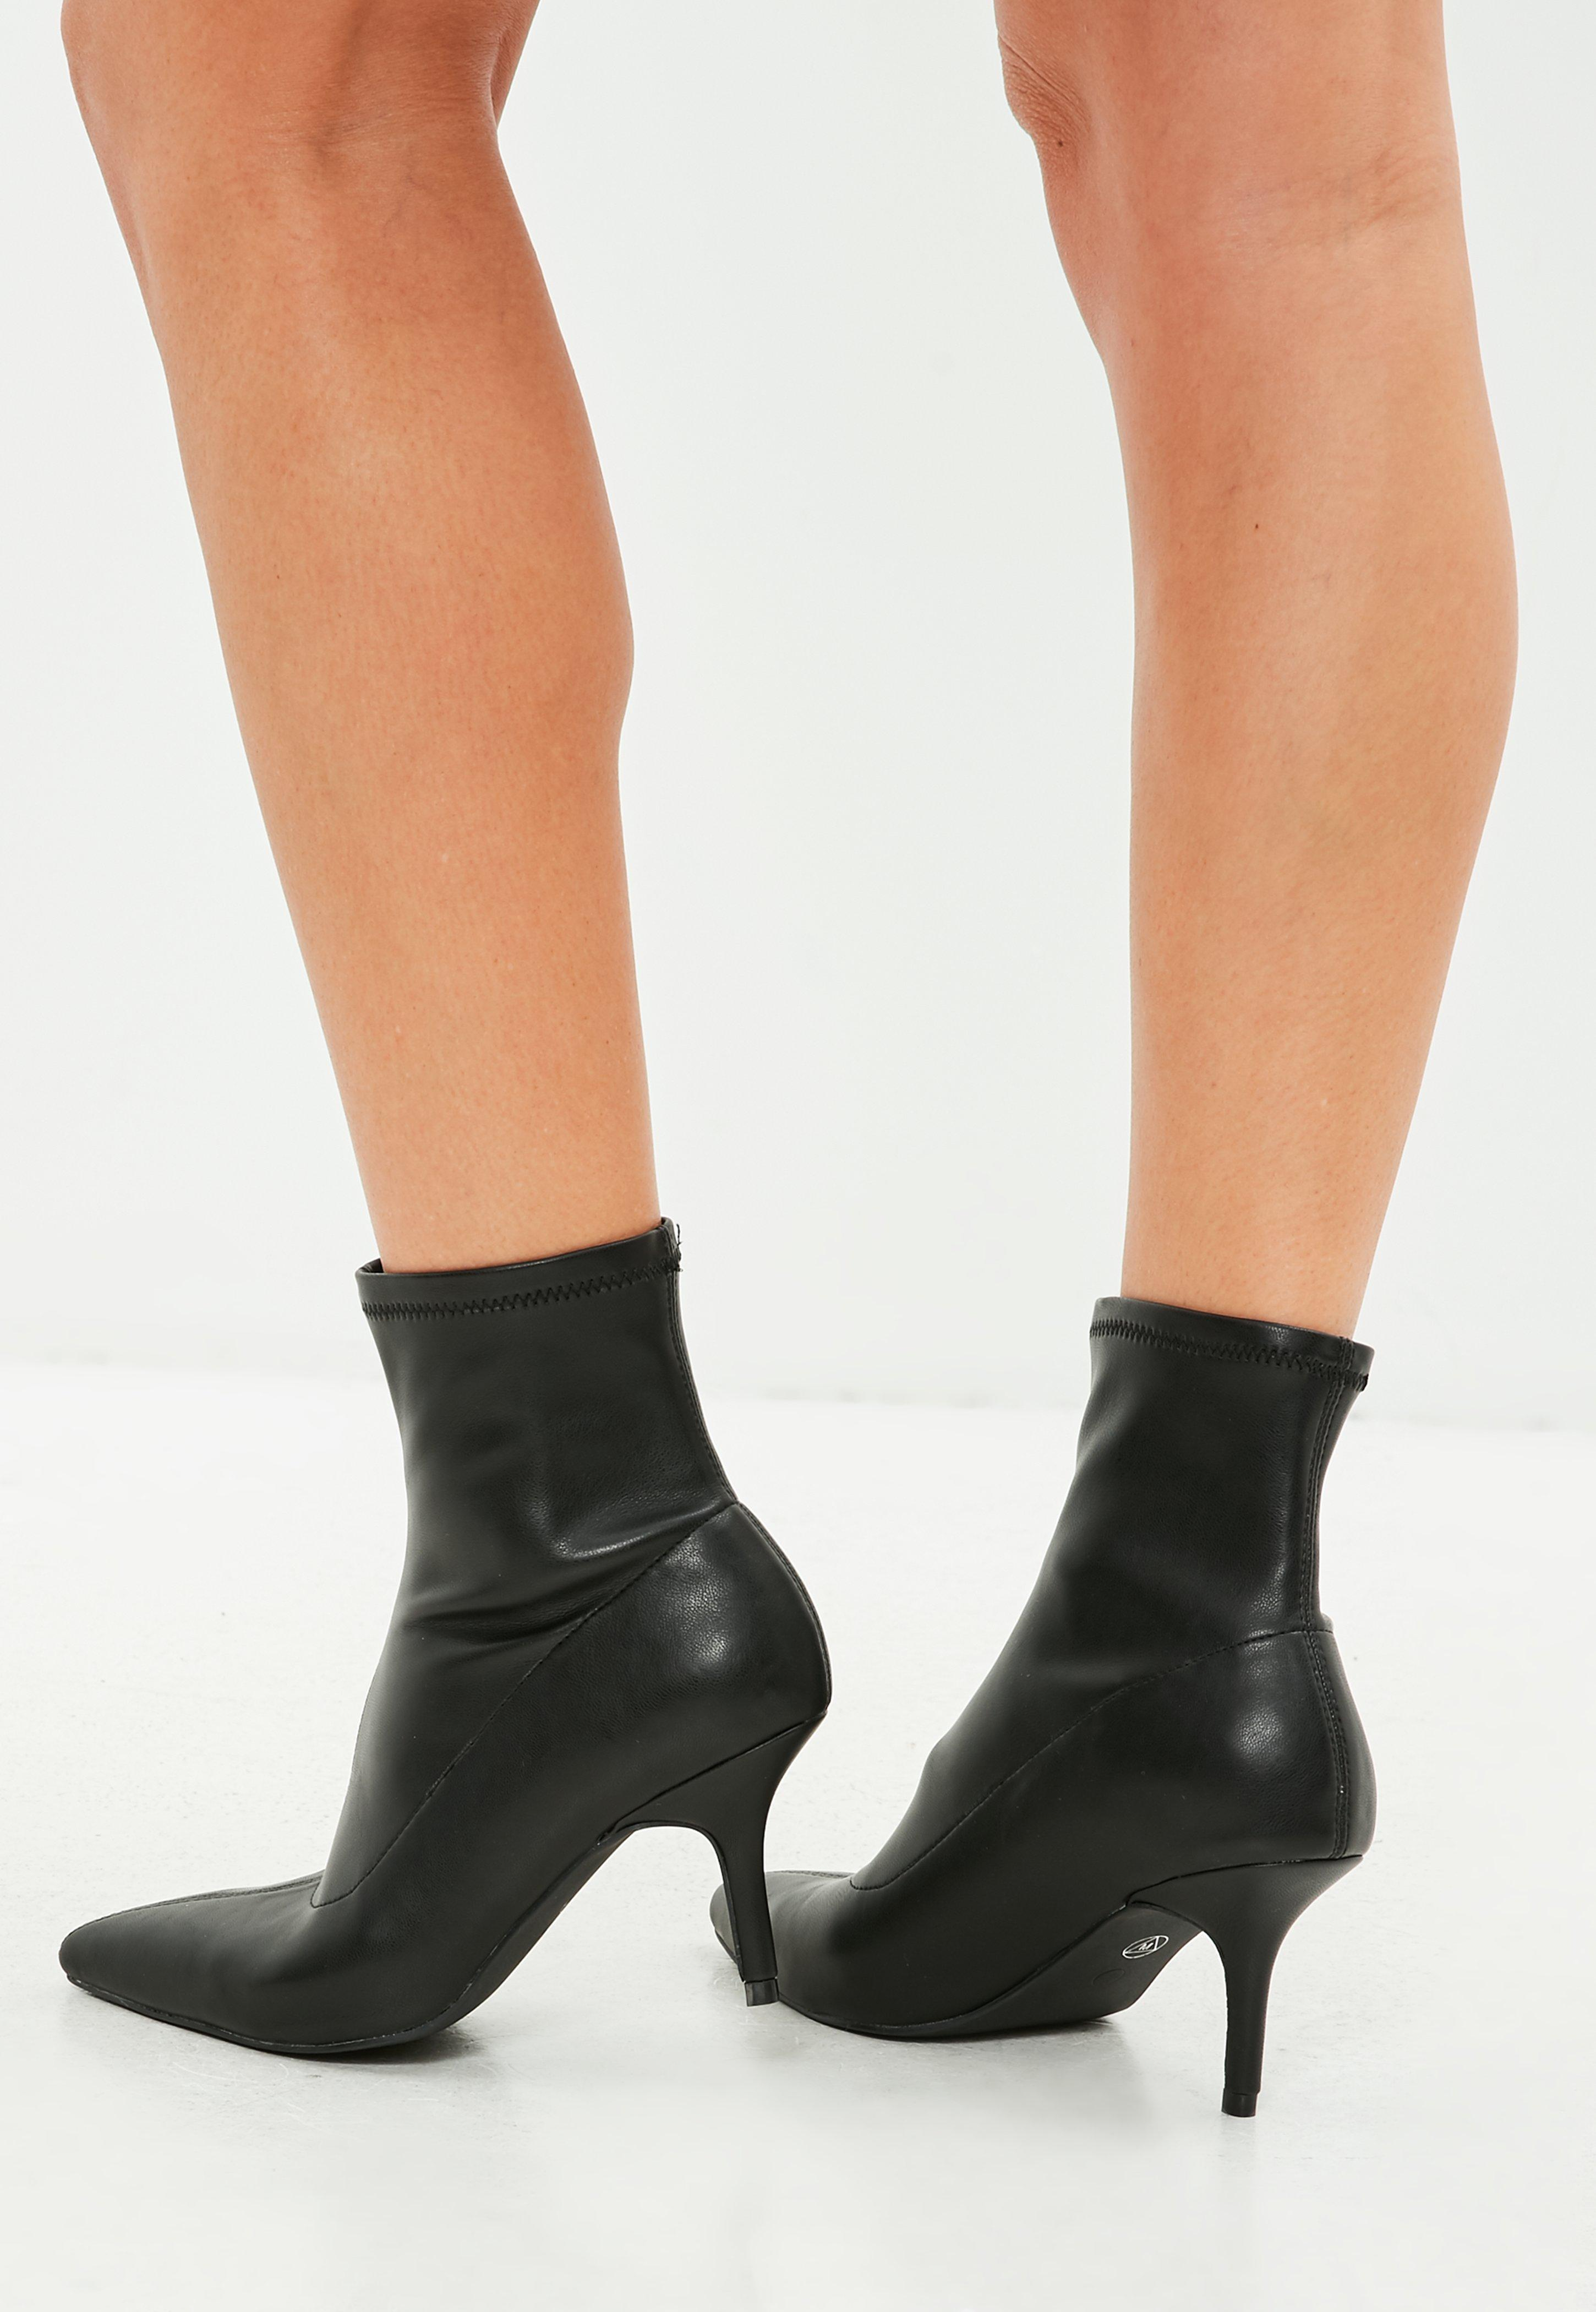 3b54651e9352 Lyst - Missguided Black Kitten Heel Ankle Boot in Black